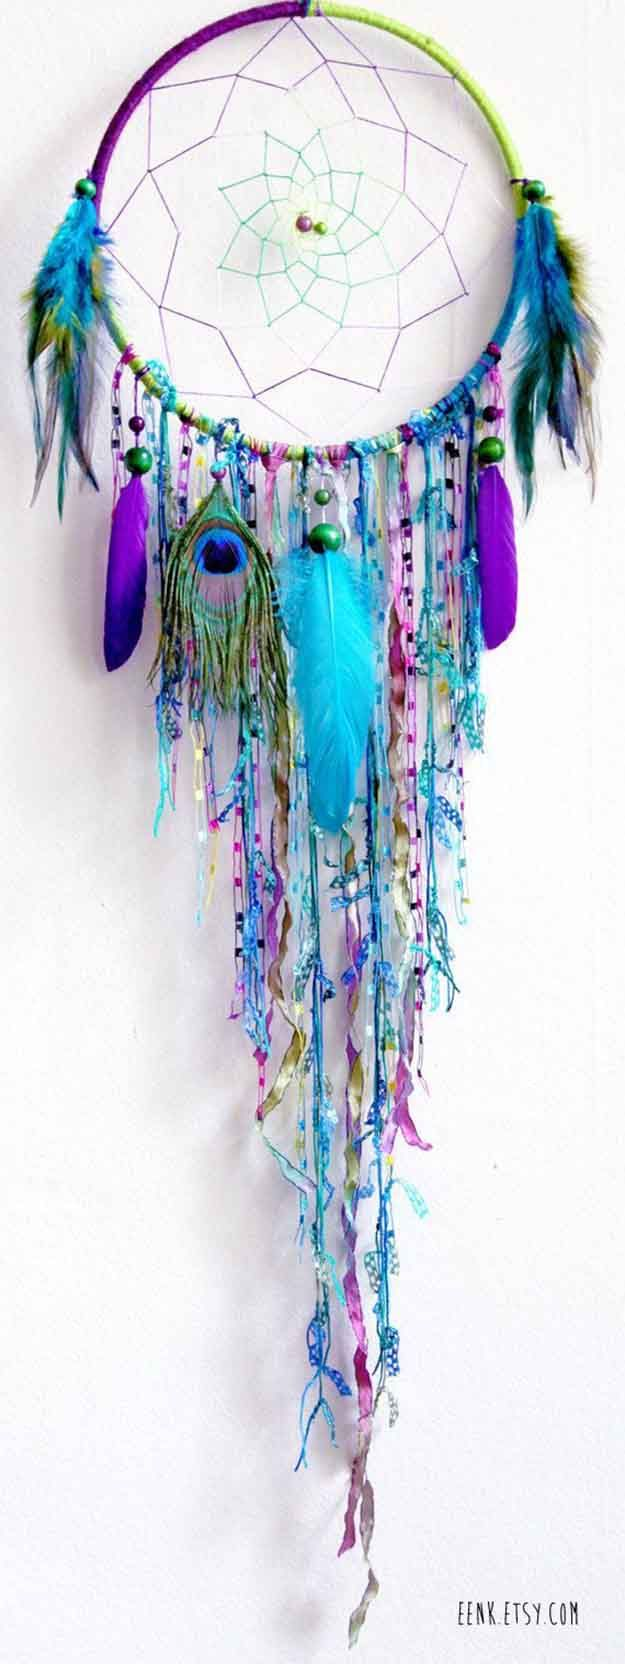 Peacock feather dreamcatcher | DIY dreammcatcher | Ideas & Inspiration, see more at http://diyready.com/diy-dreamcatcher-ideas-instructions-inspiration